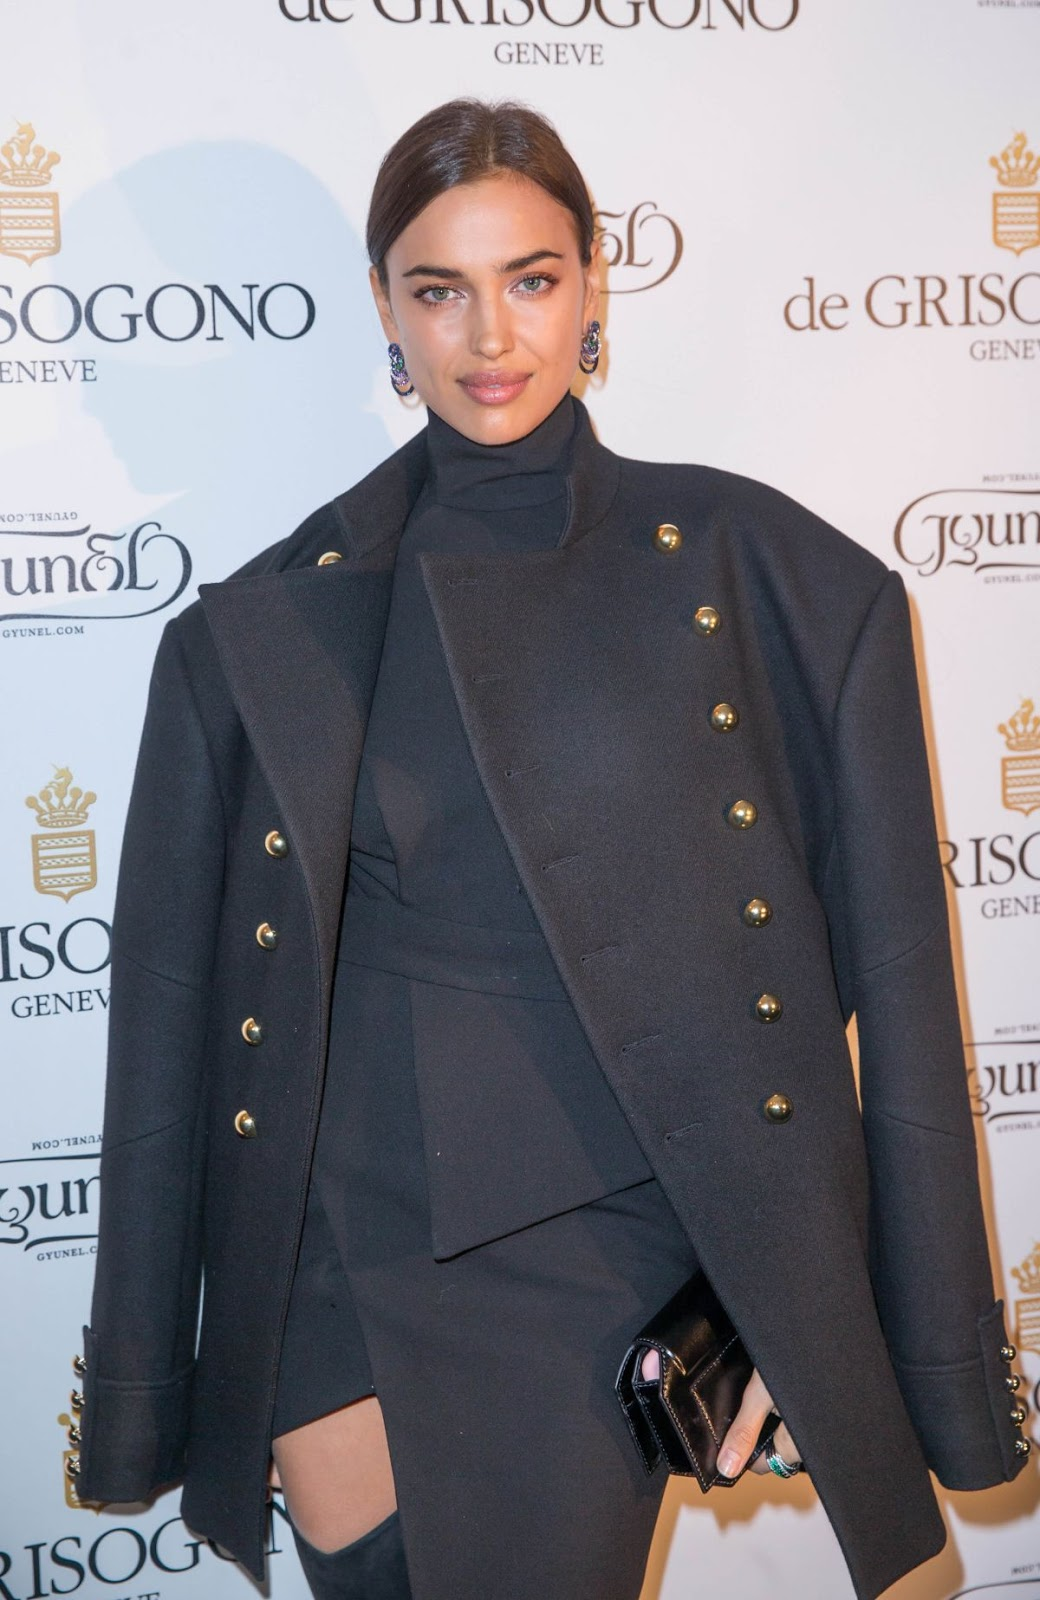 Cristiano Ronaldo Girlfriend Irina Shayk at De Grisogono Photocall at Rue De La Boetie in Paris